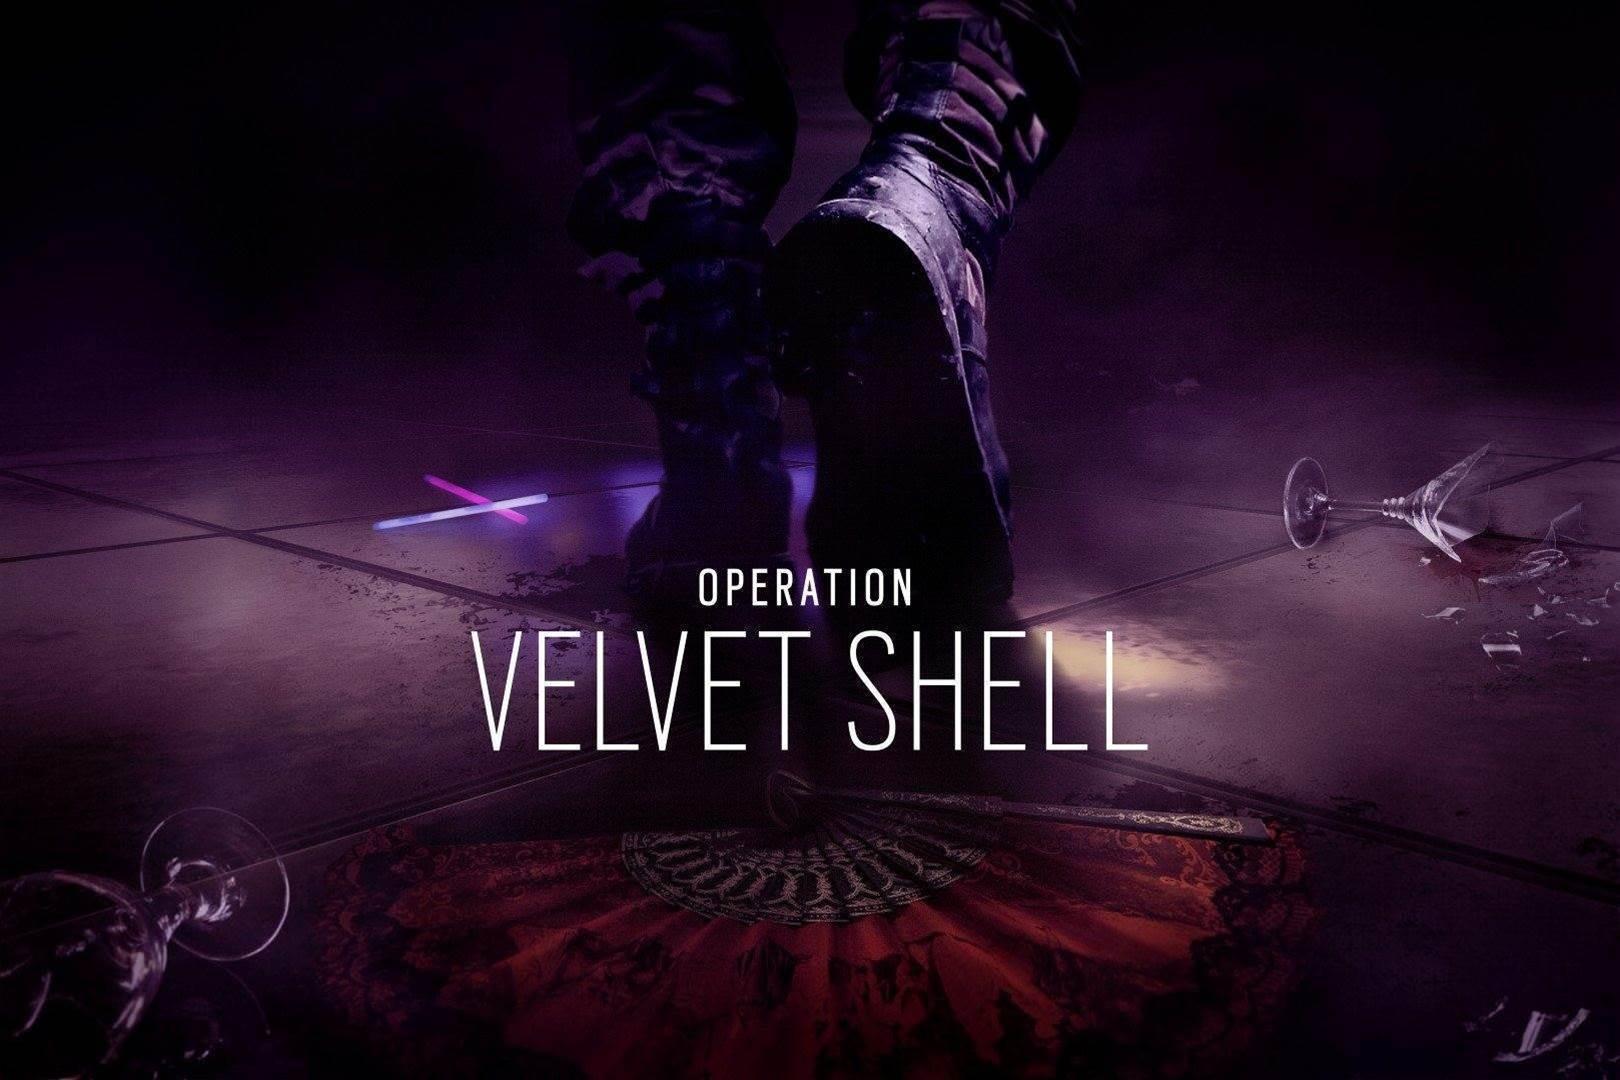 Six shots from Rainbow Six Siege's Operation Velvet Shell DLC